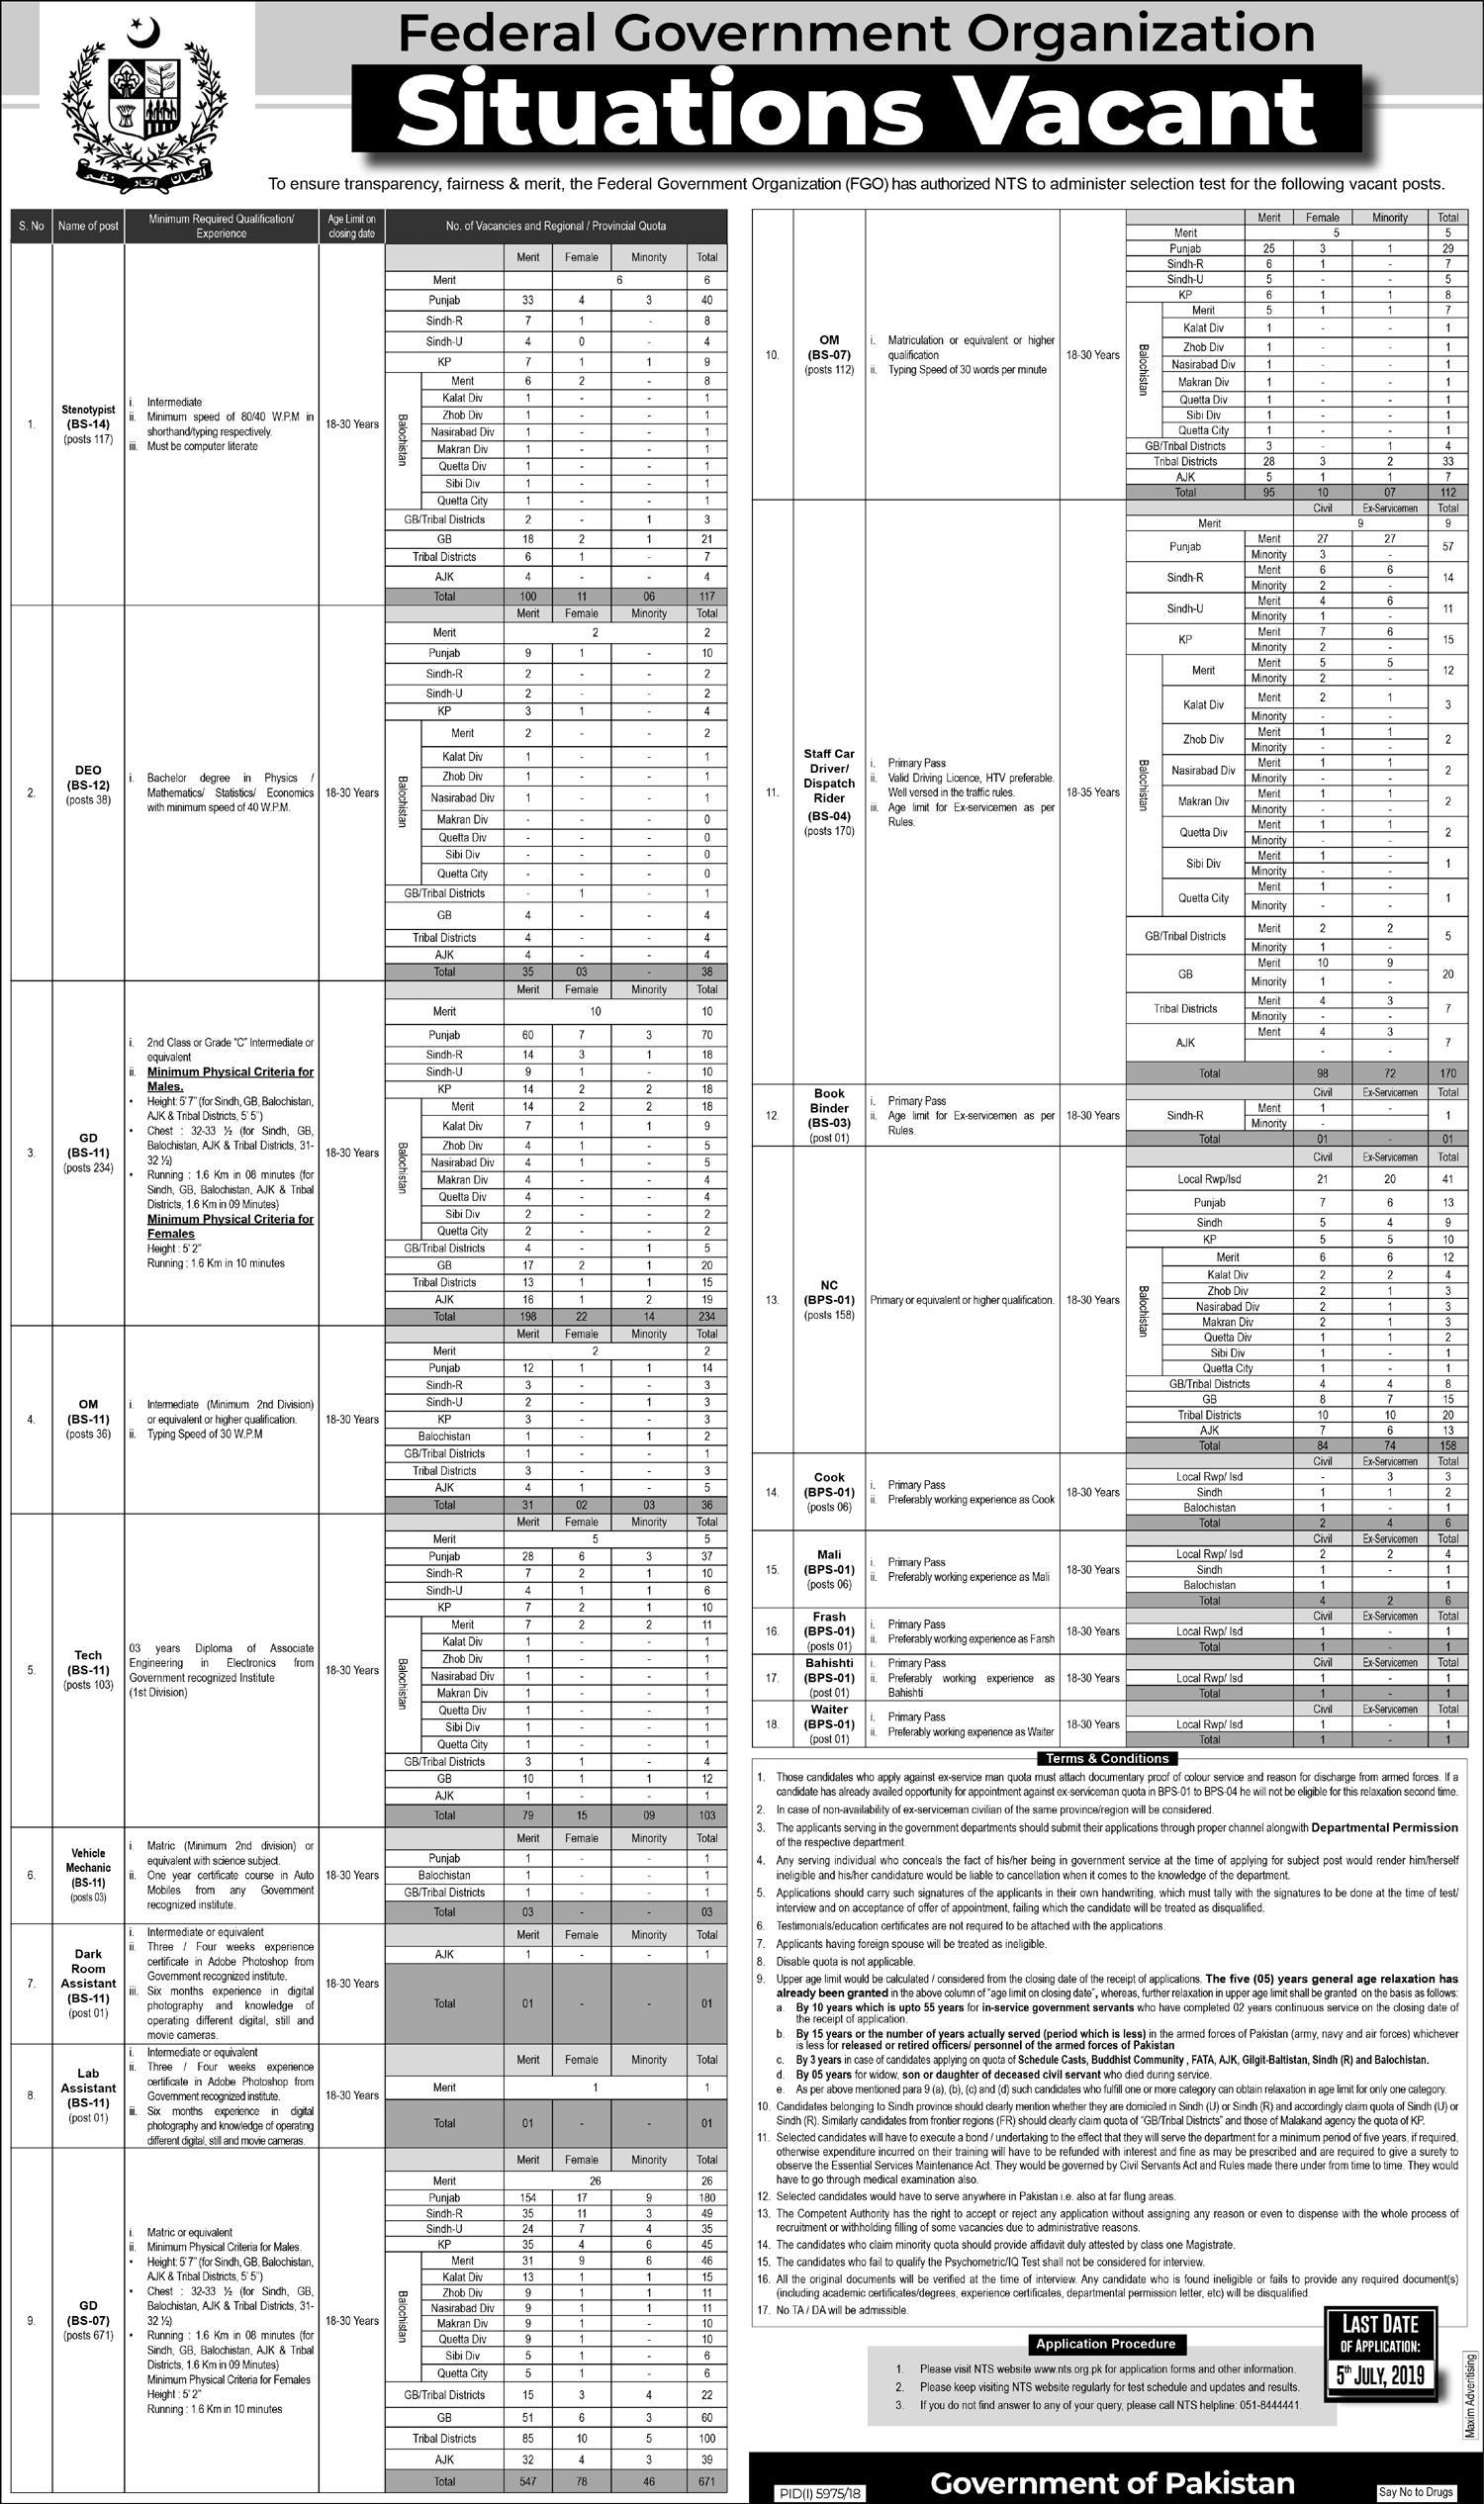 Intelligence Bureau Pakistan Jobs June 2019 - NTS Advertisement And Form